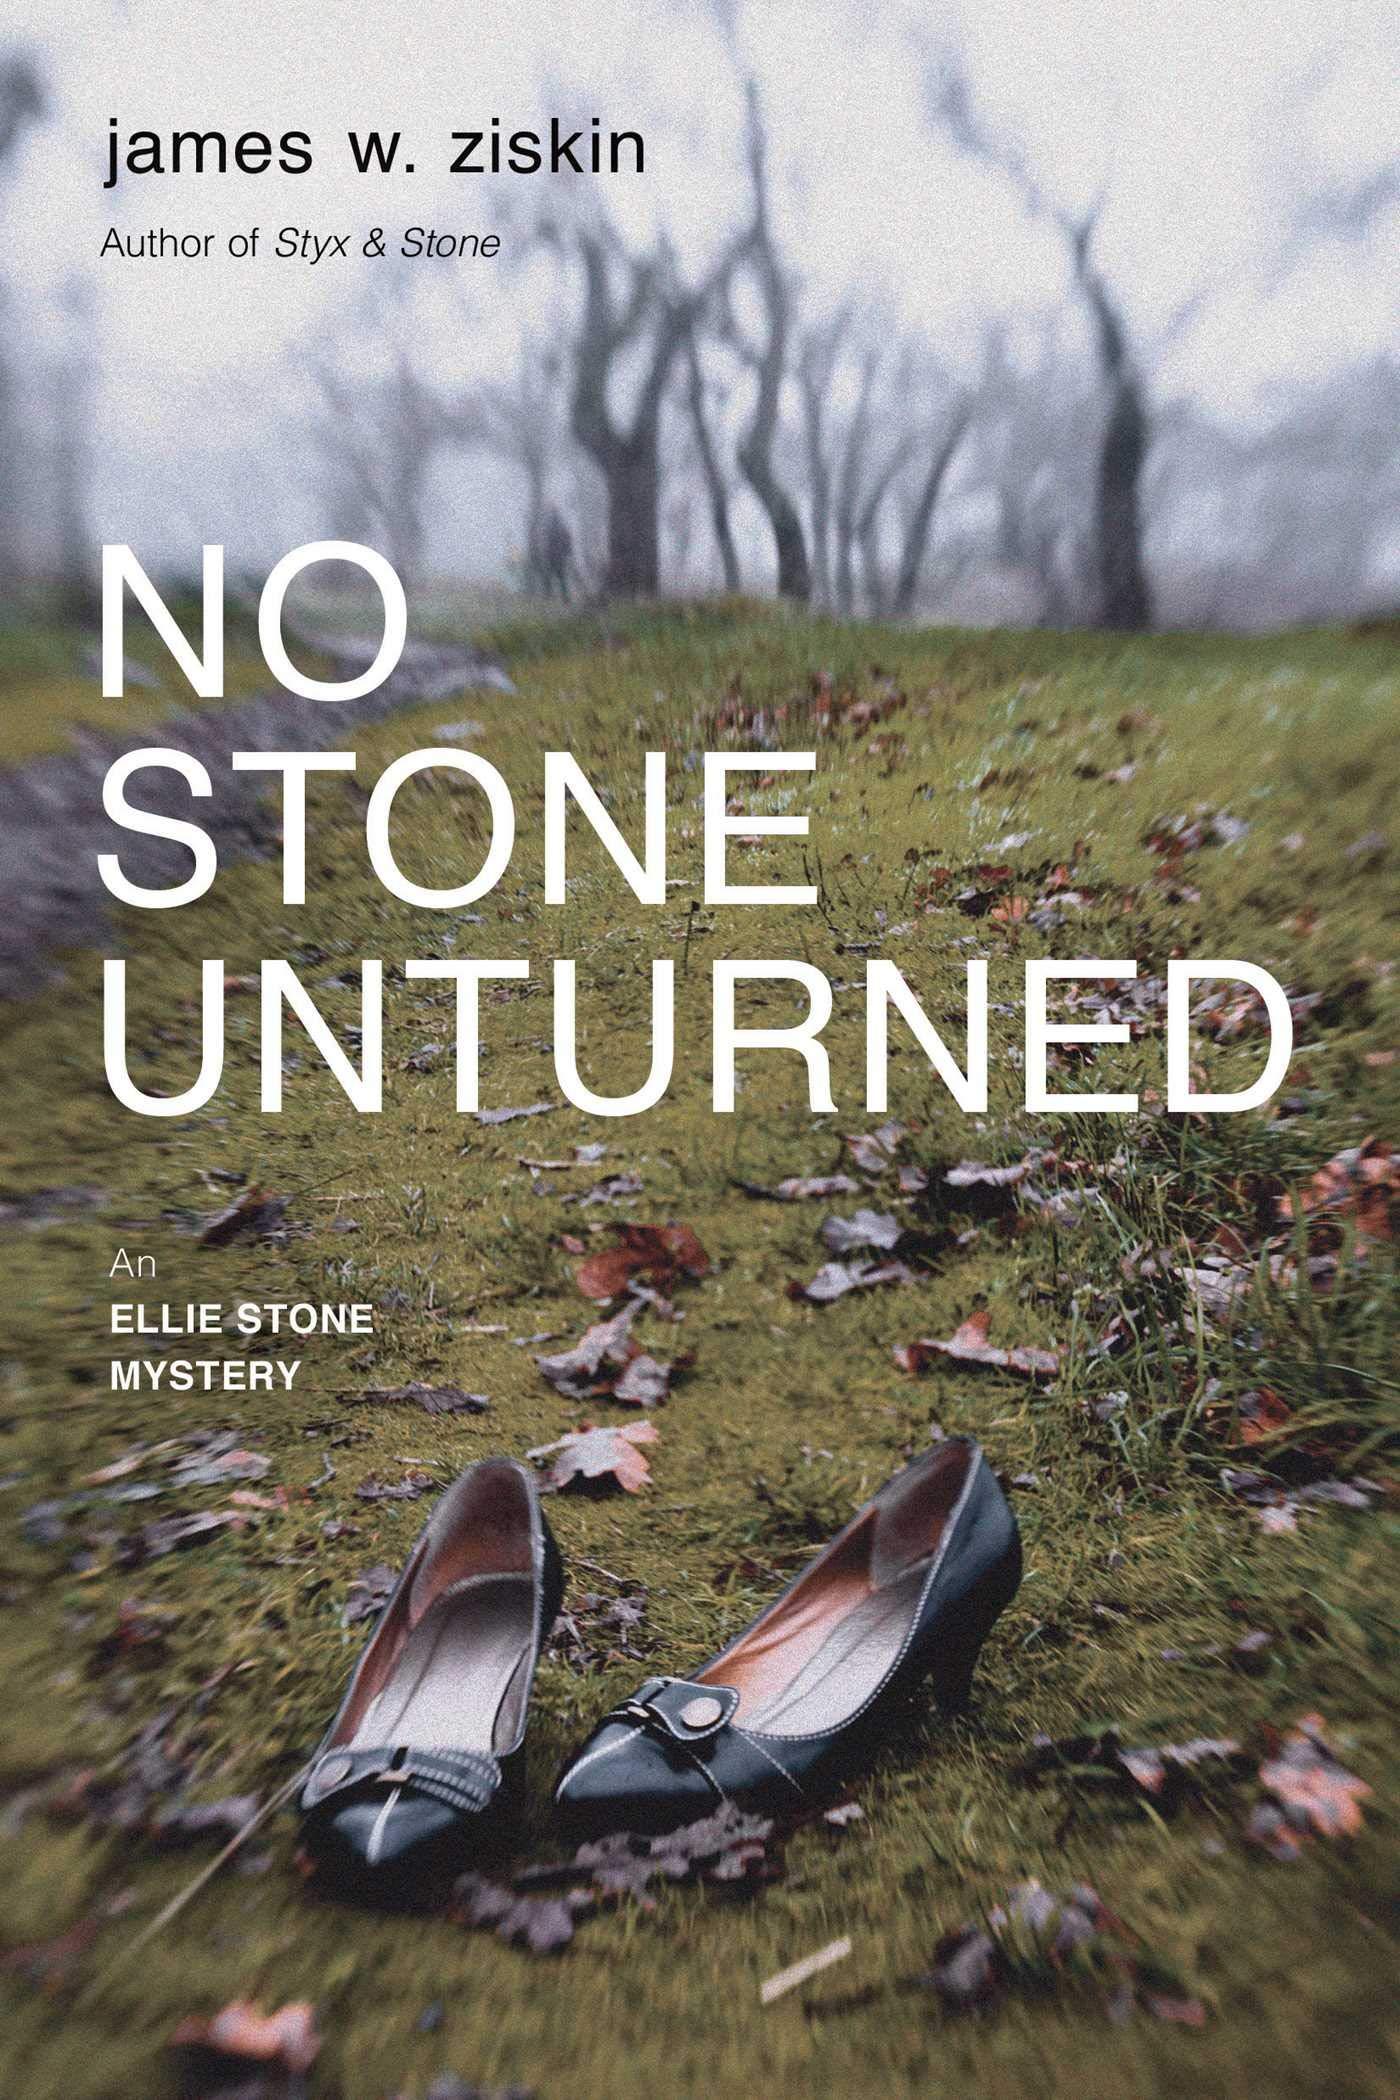 No Stone Unturned: An Ellie Stone Mystery (Ellie Stone